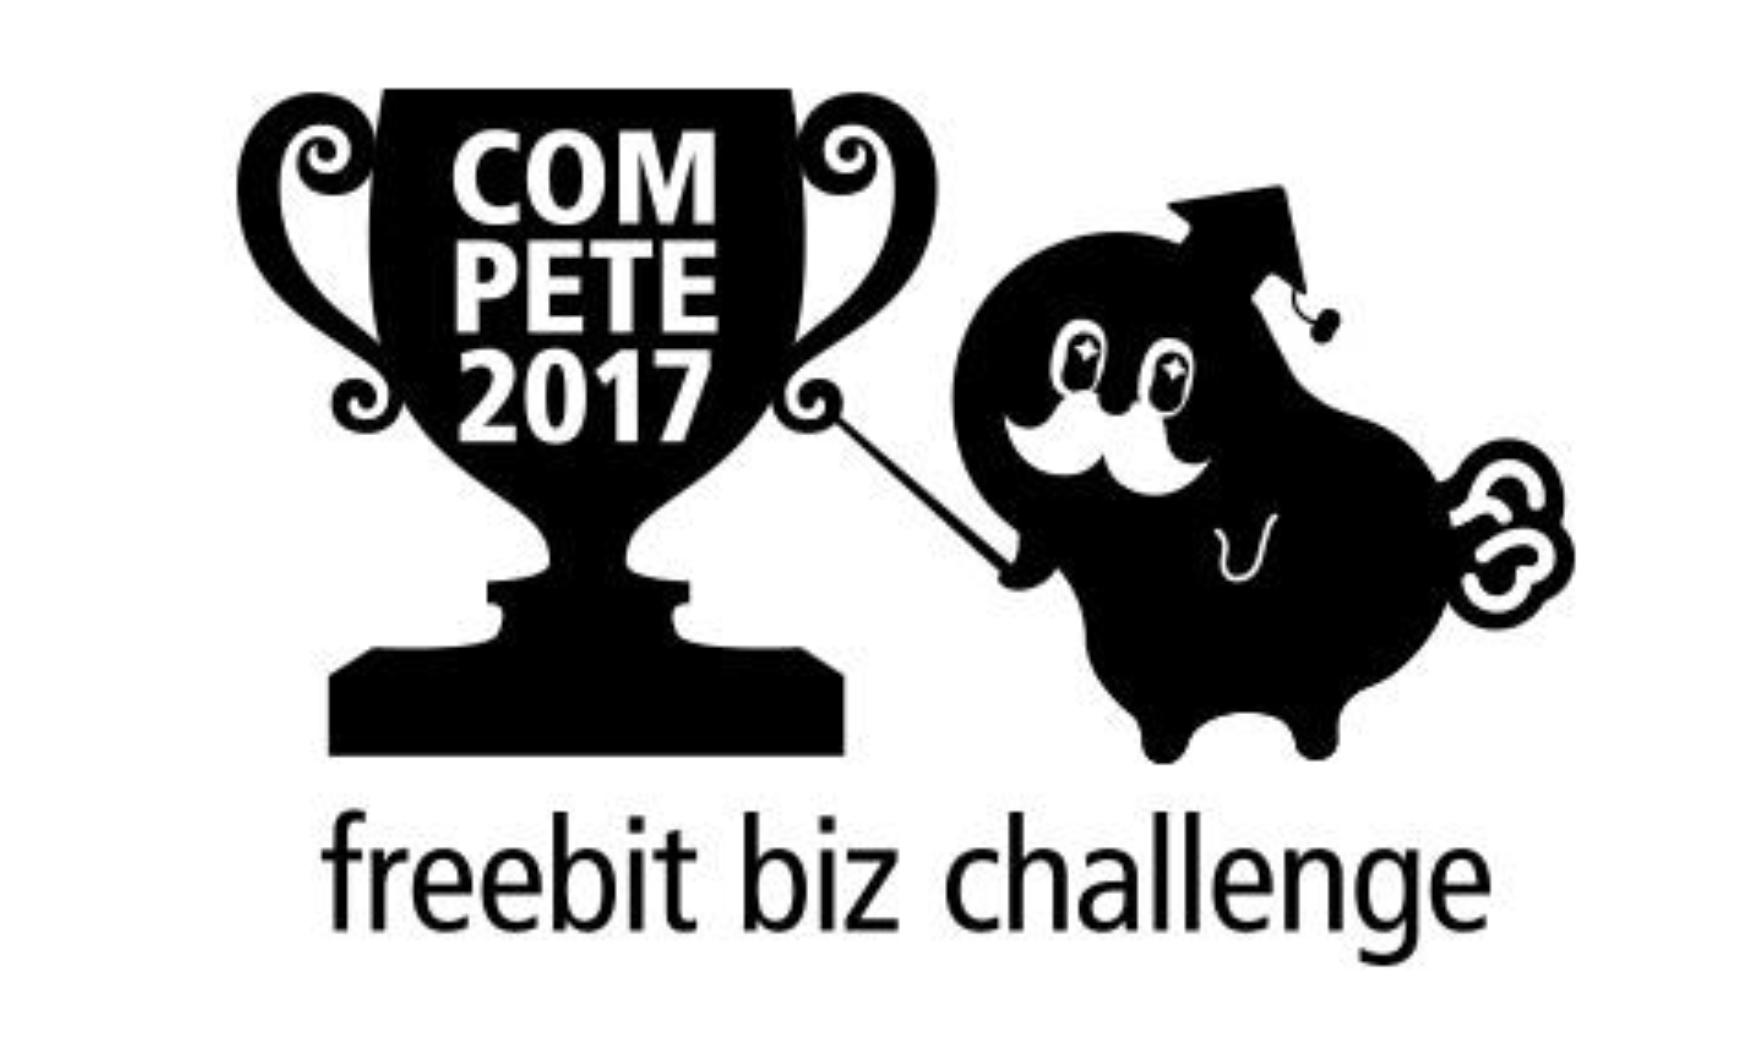 freebit_biz_challenge